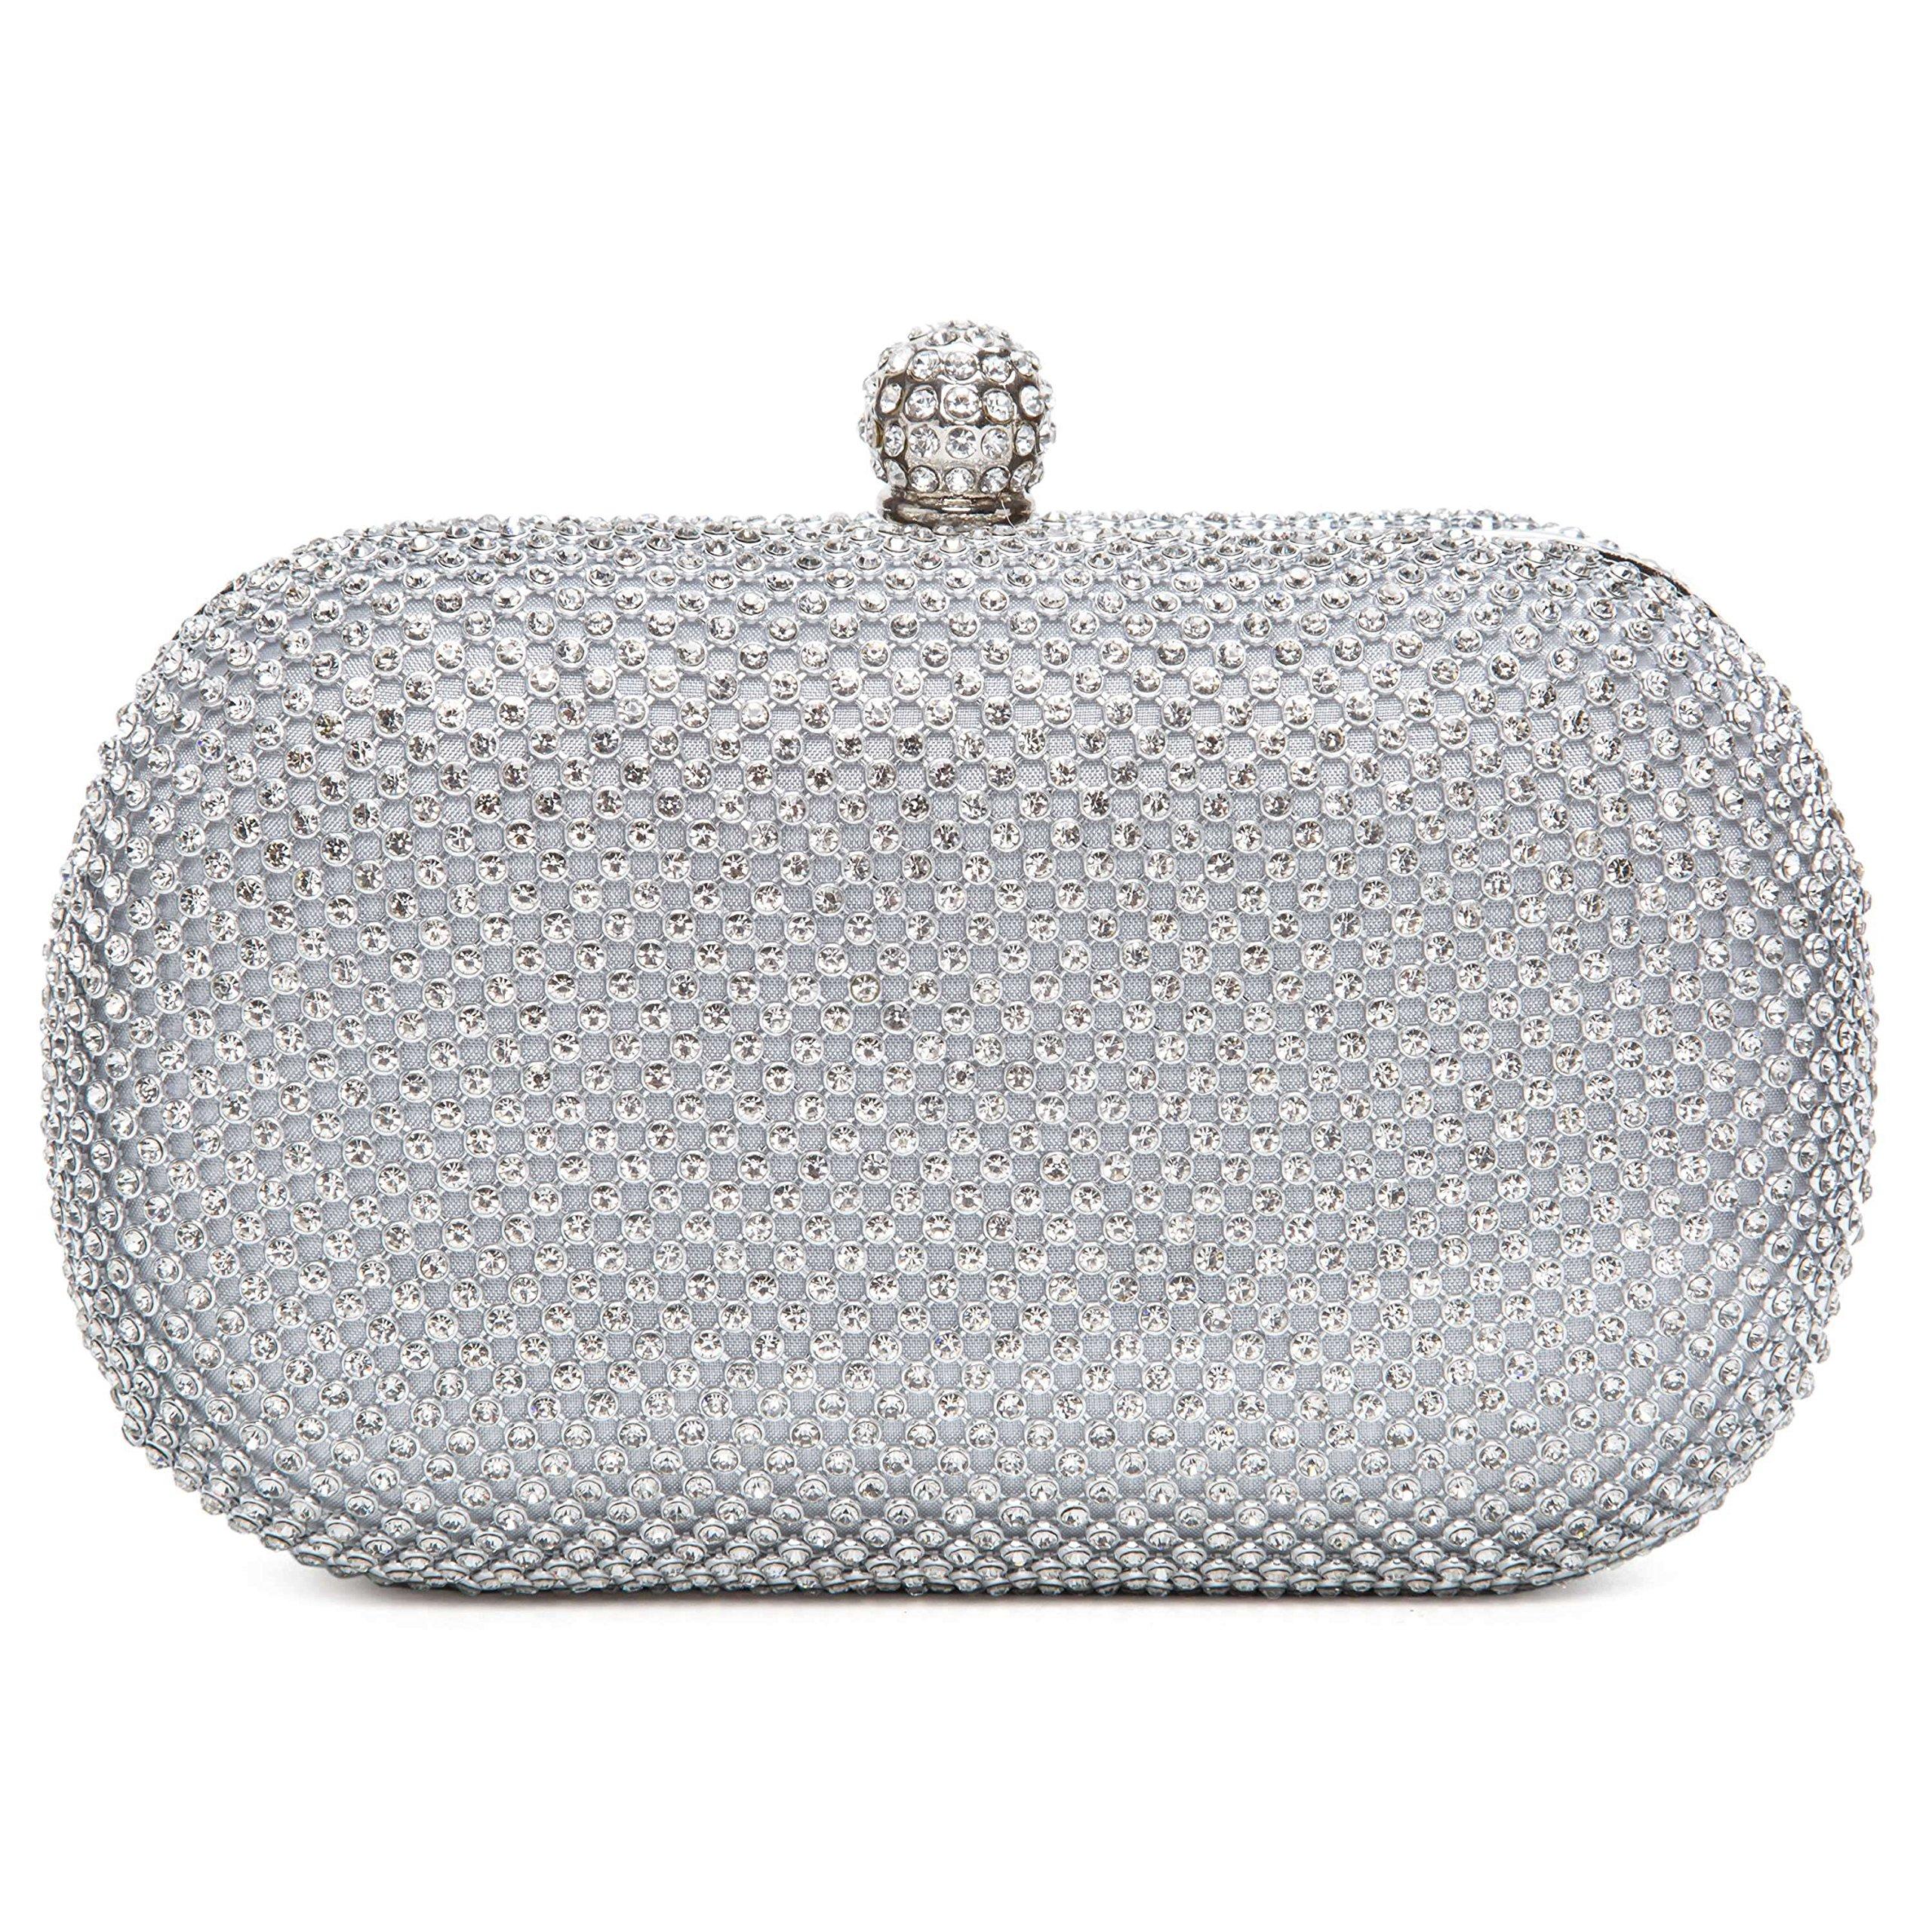 Chichitop Evening Bag Full Crystal Hard Case Wedding Prom Formal Clutch Handbag Purse for Women,Silver